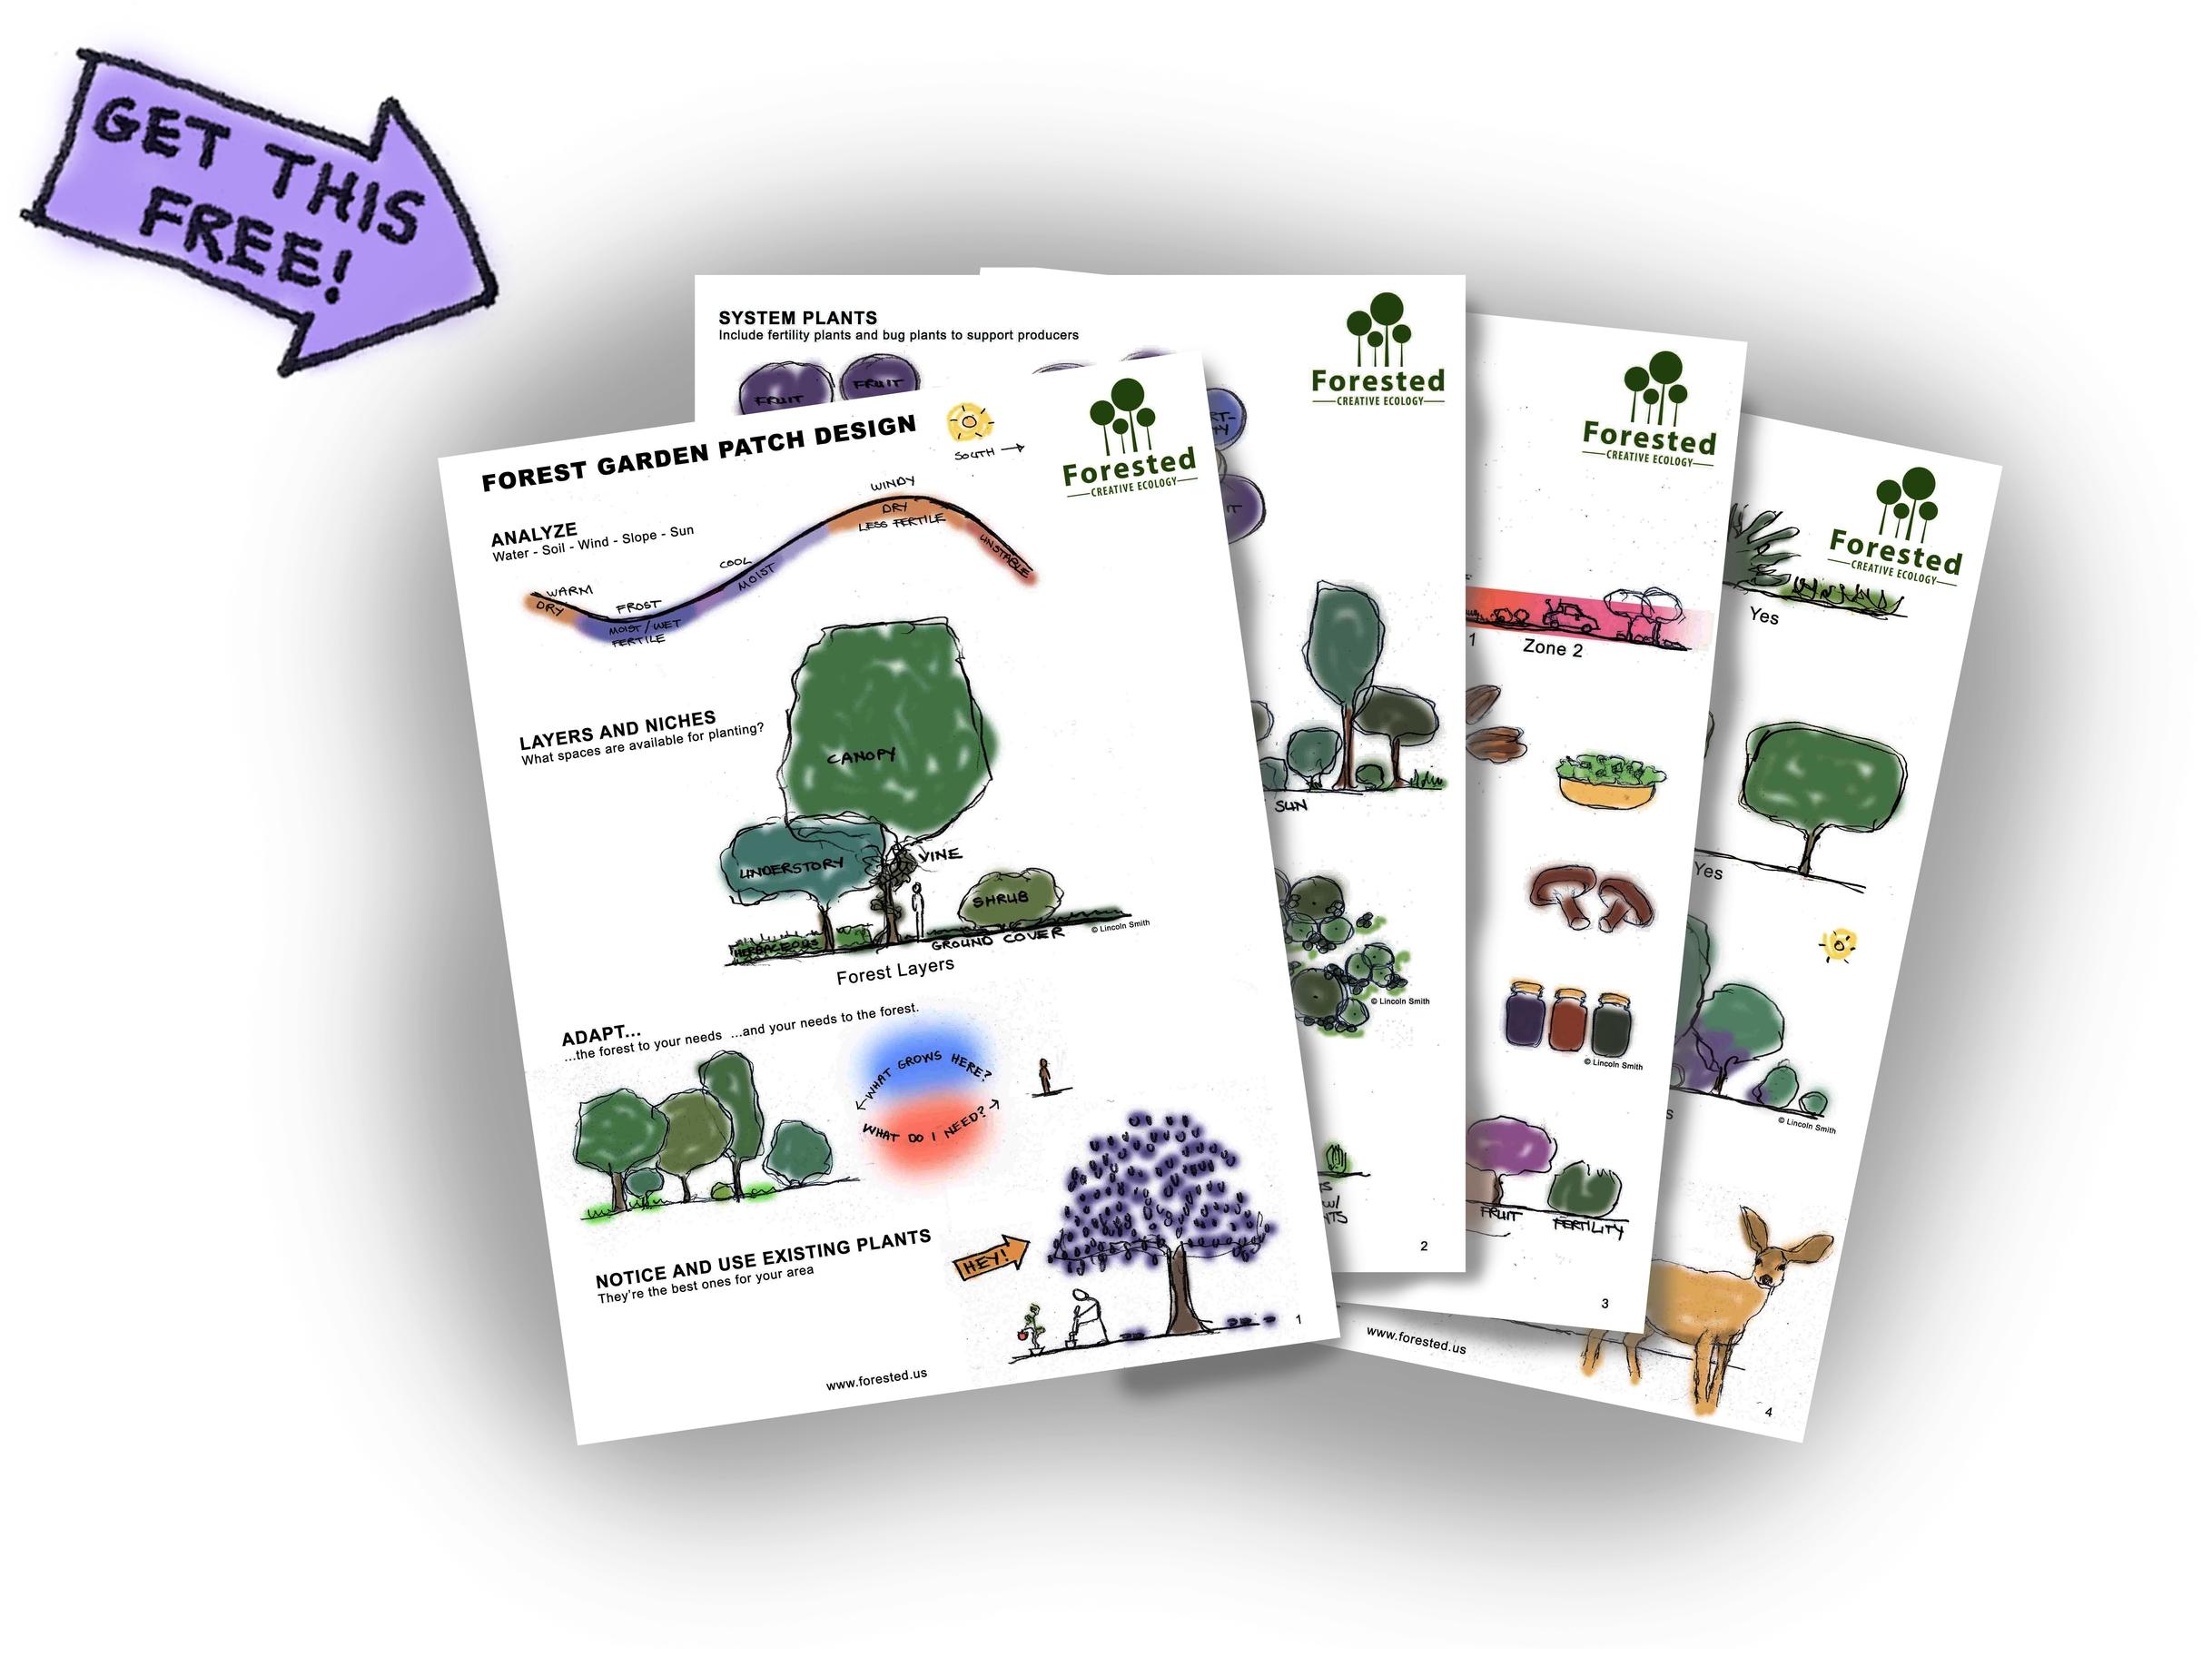 Forest garden design guide